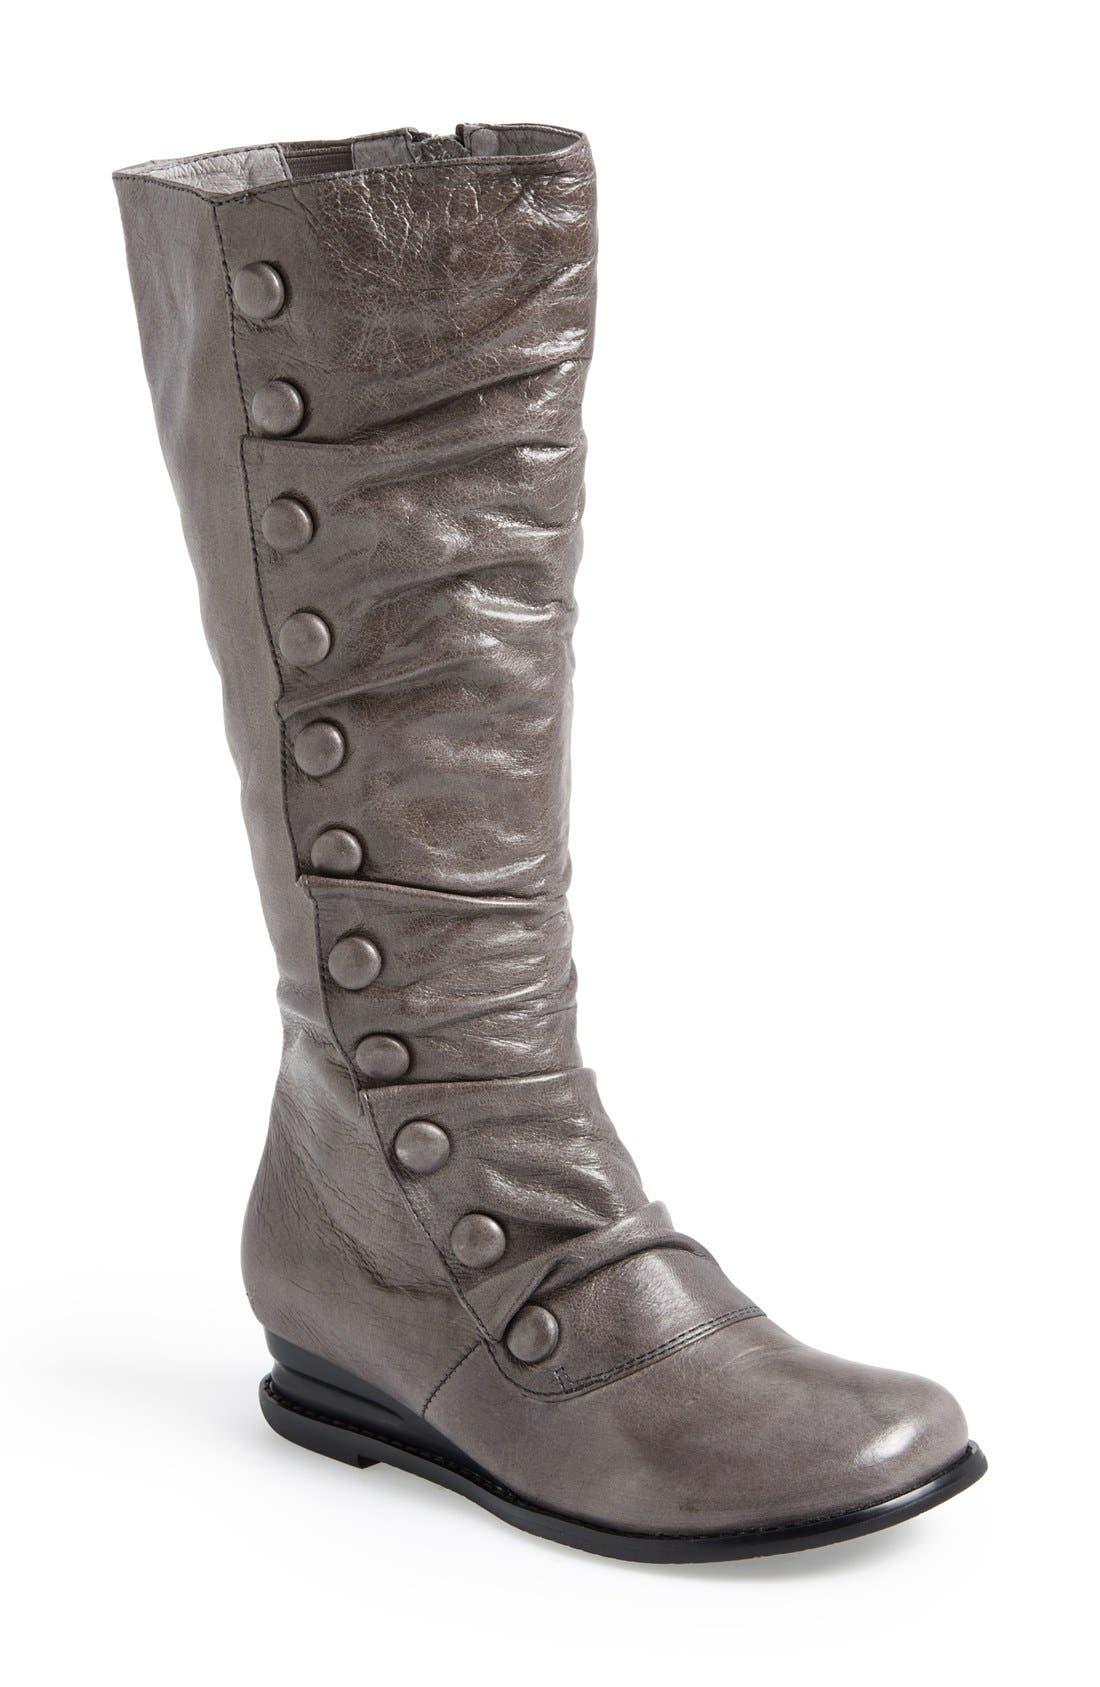 Alternate Image 1 Selected - Miz Mooz 'Bloom' Leather Boot (Women)(Wide Calf)